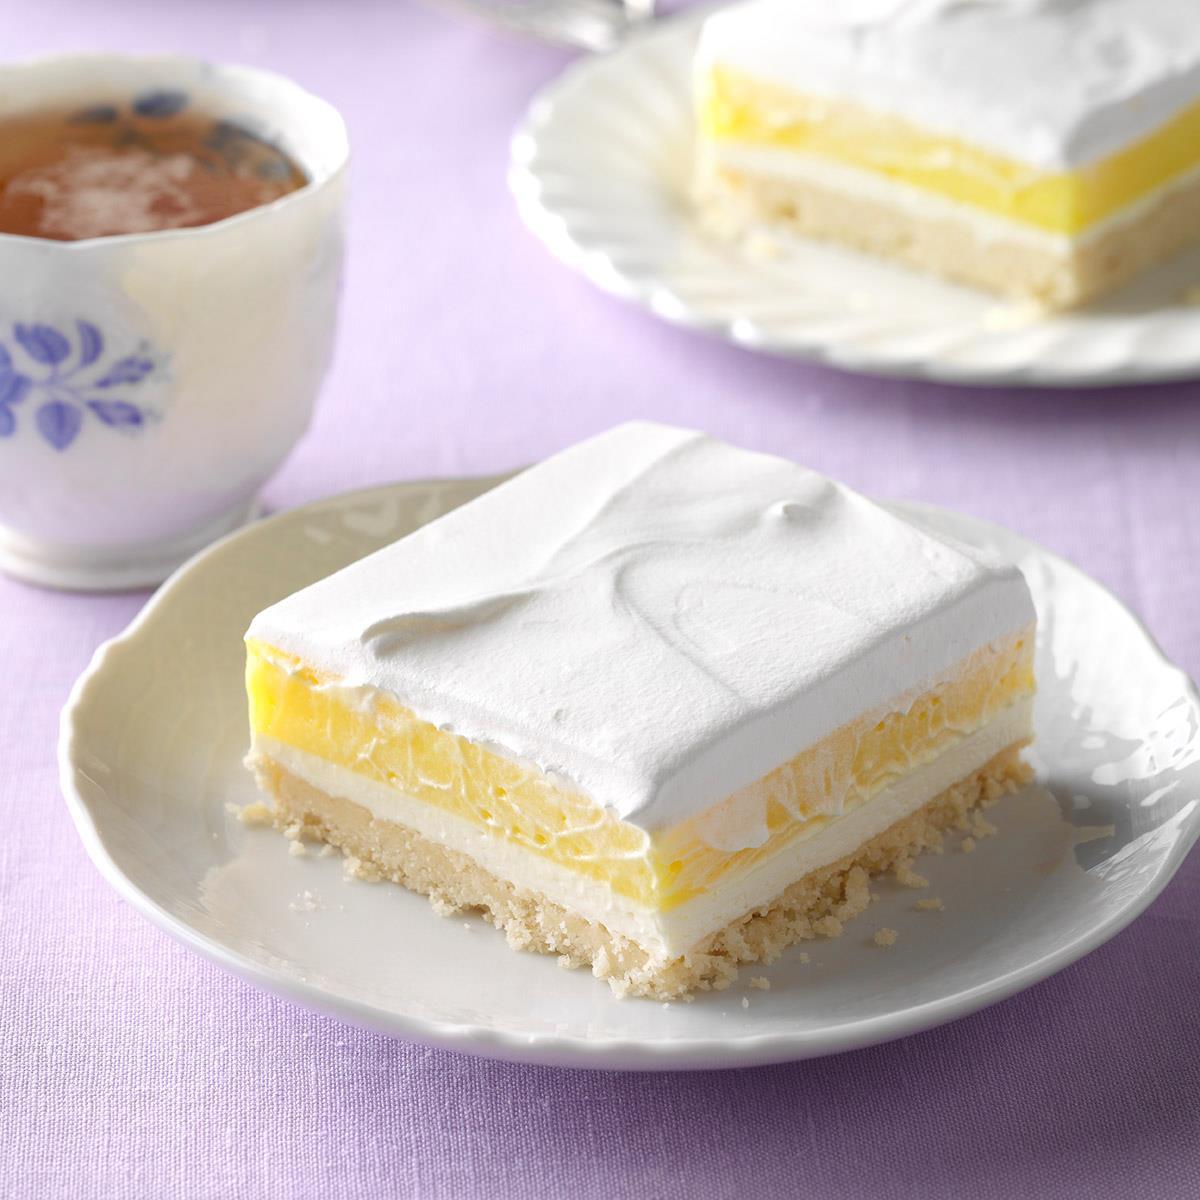 Pudding Dessert Recipe  Lemon Pudding Dessert Recipe